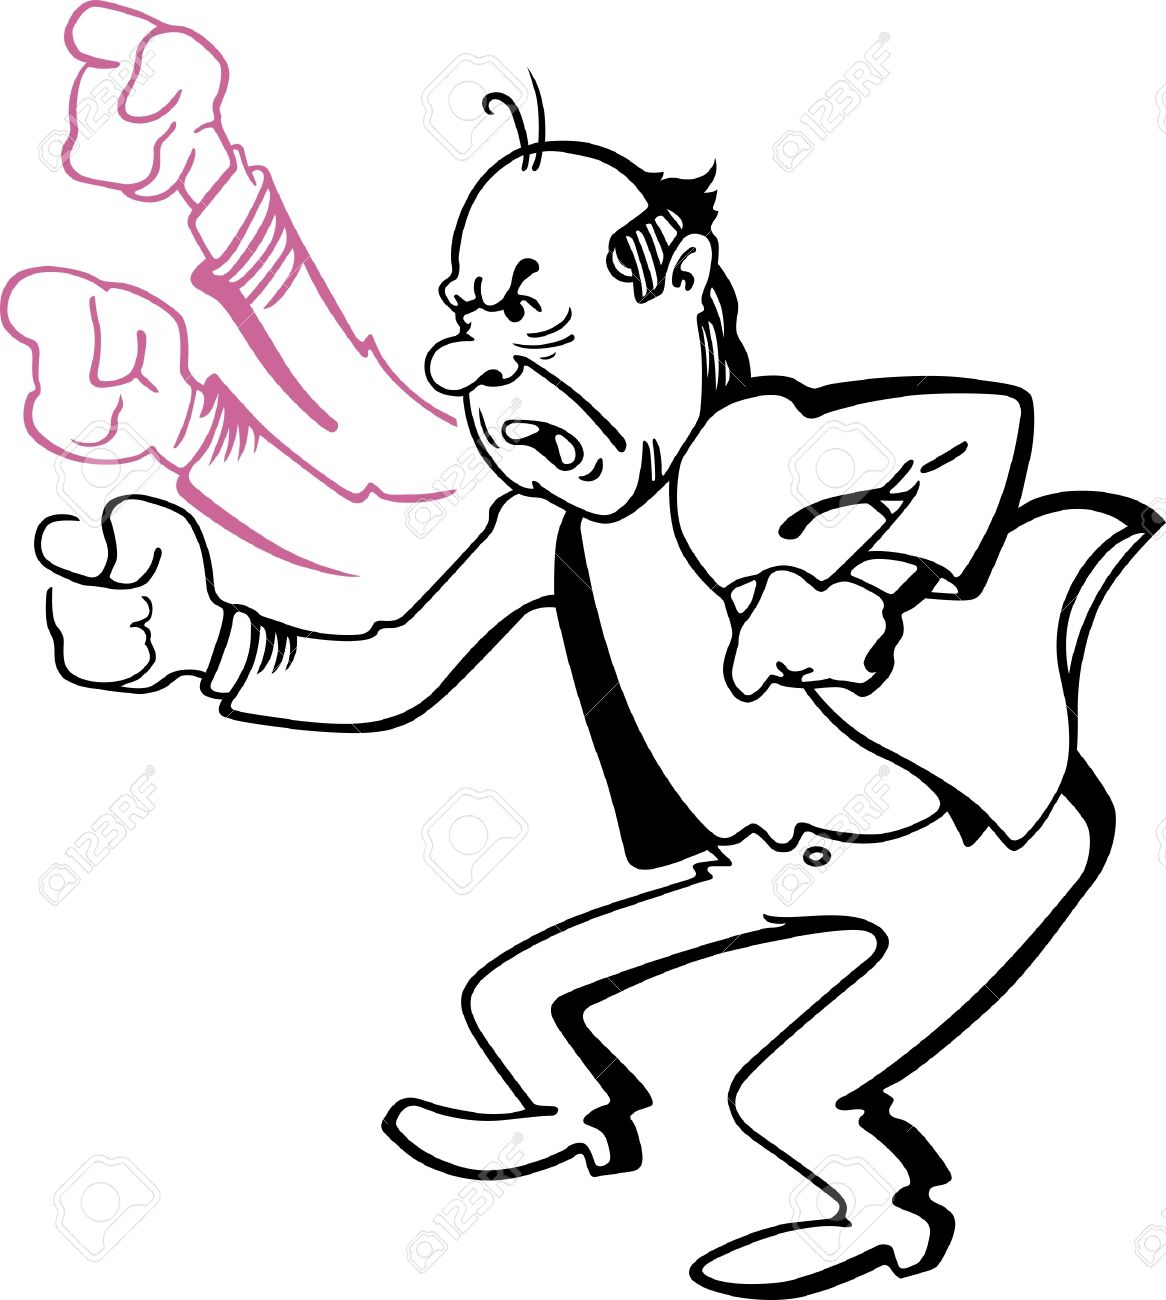 Angry Man Shaking His Fist Royalty Free Cliparts, Vectors, And ...